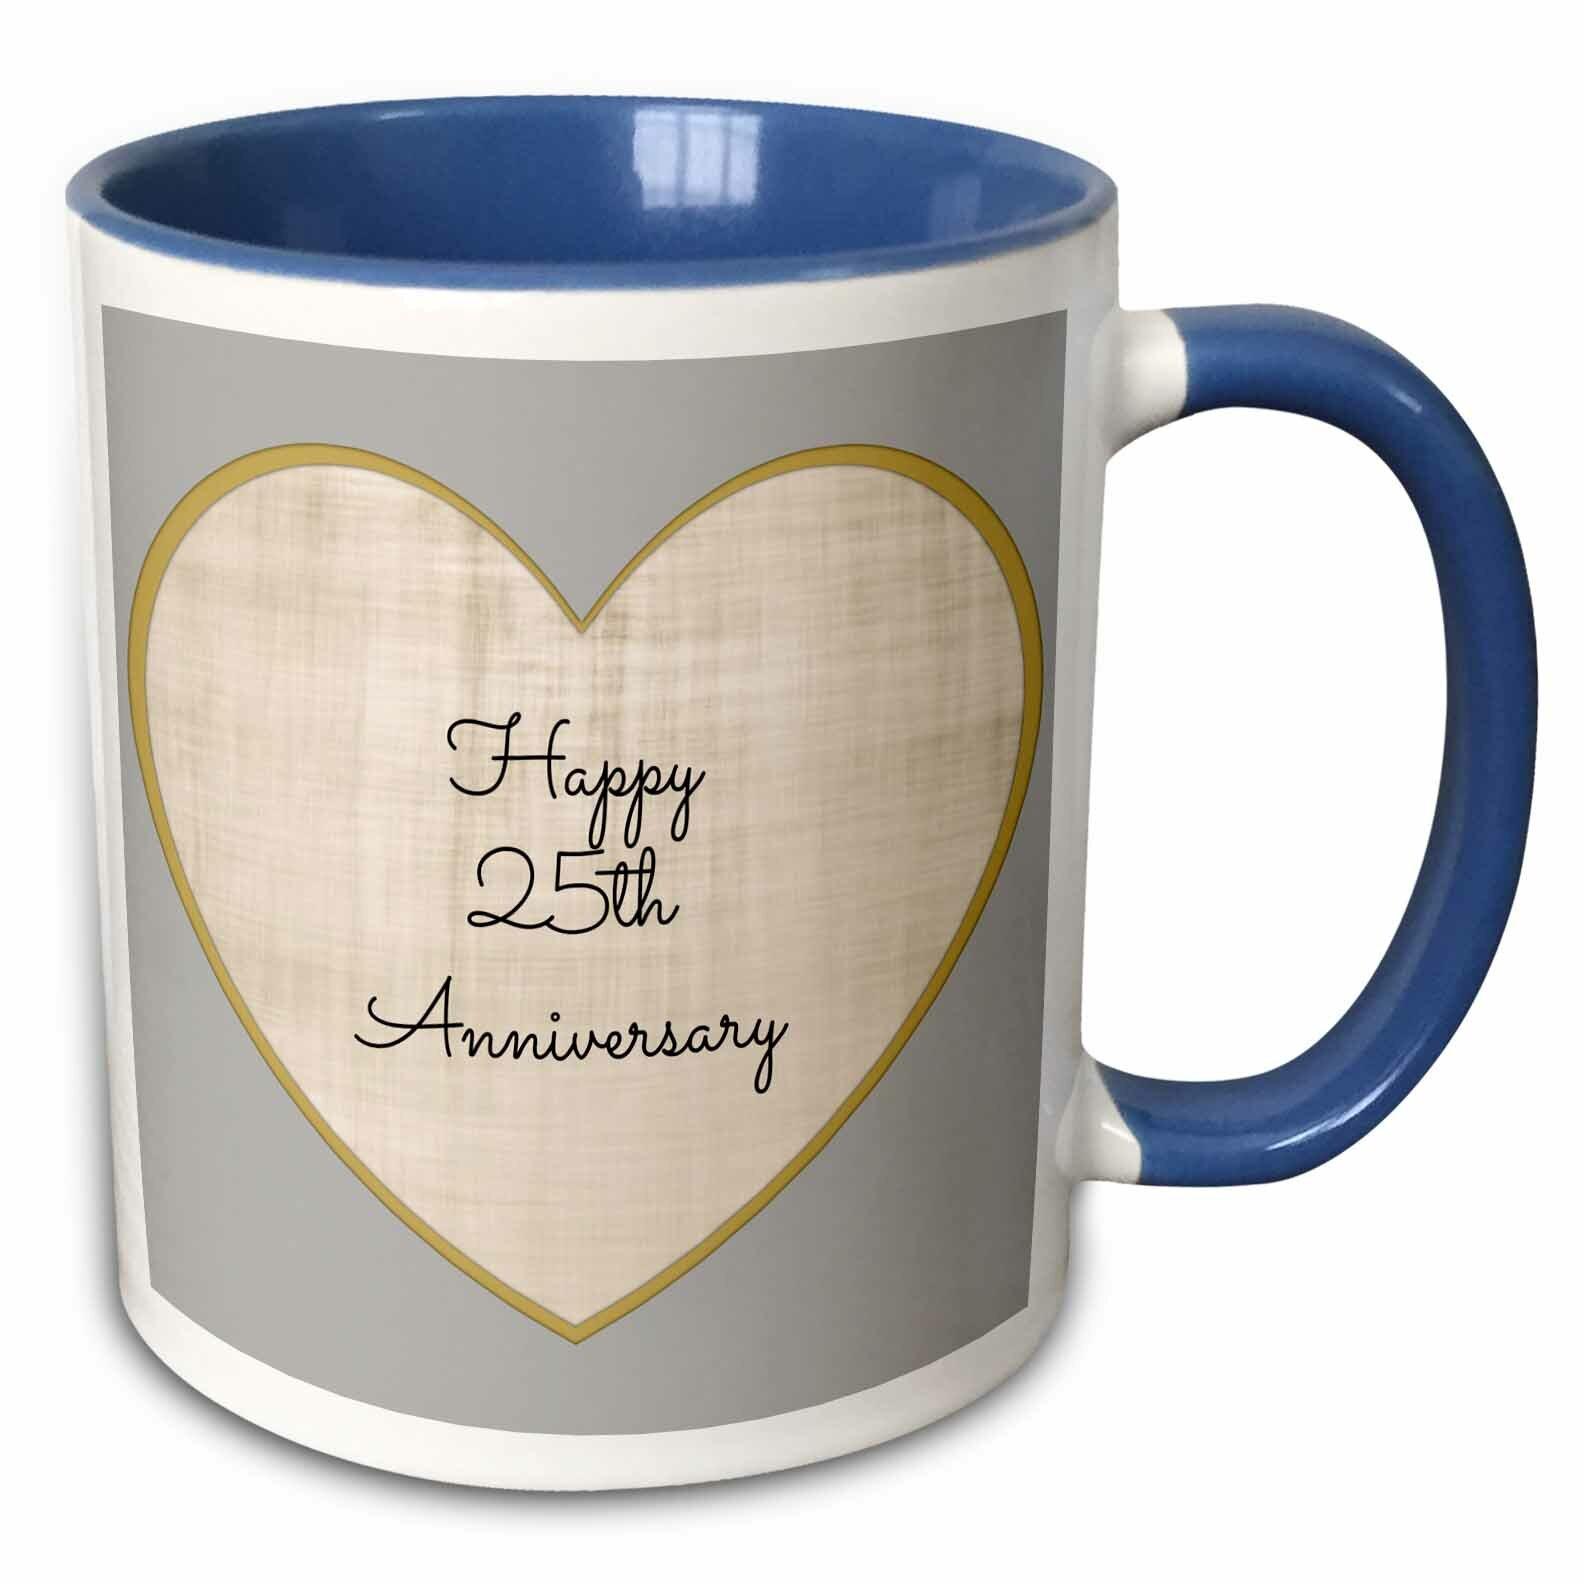 Symple Stuff Mullings Happy 50th Anniversary With Heart Background Coffee Mug Wayfair